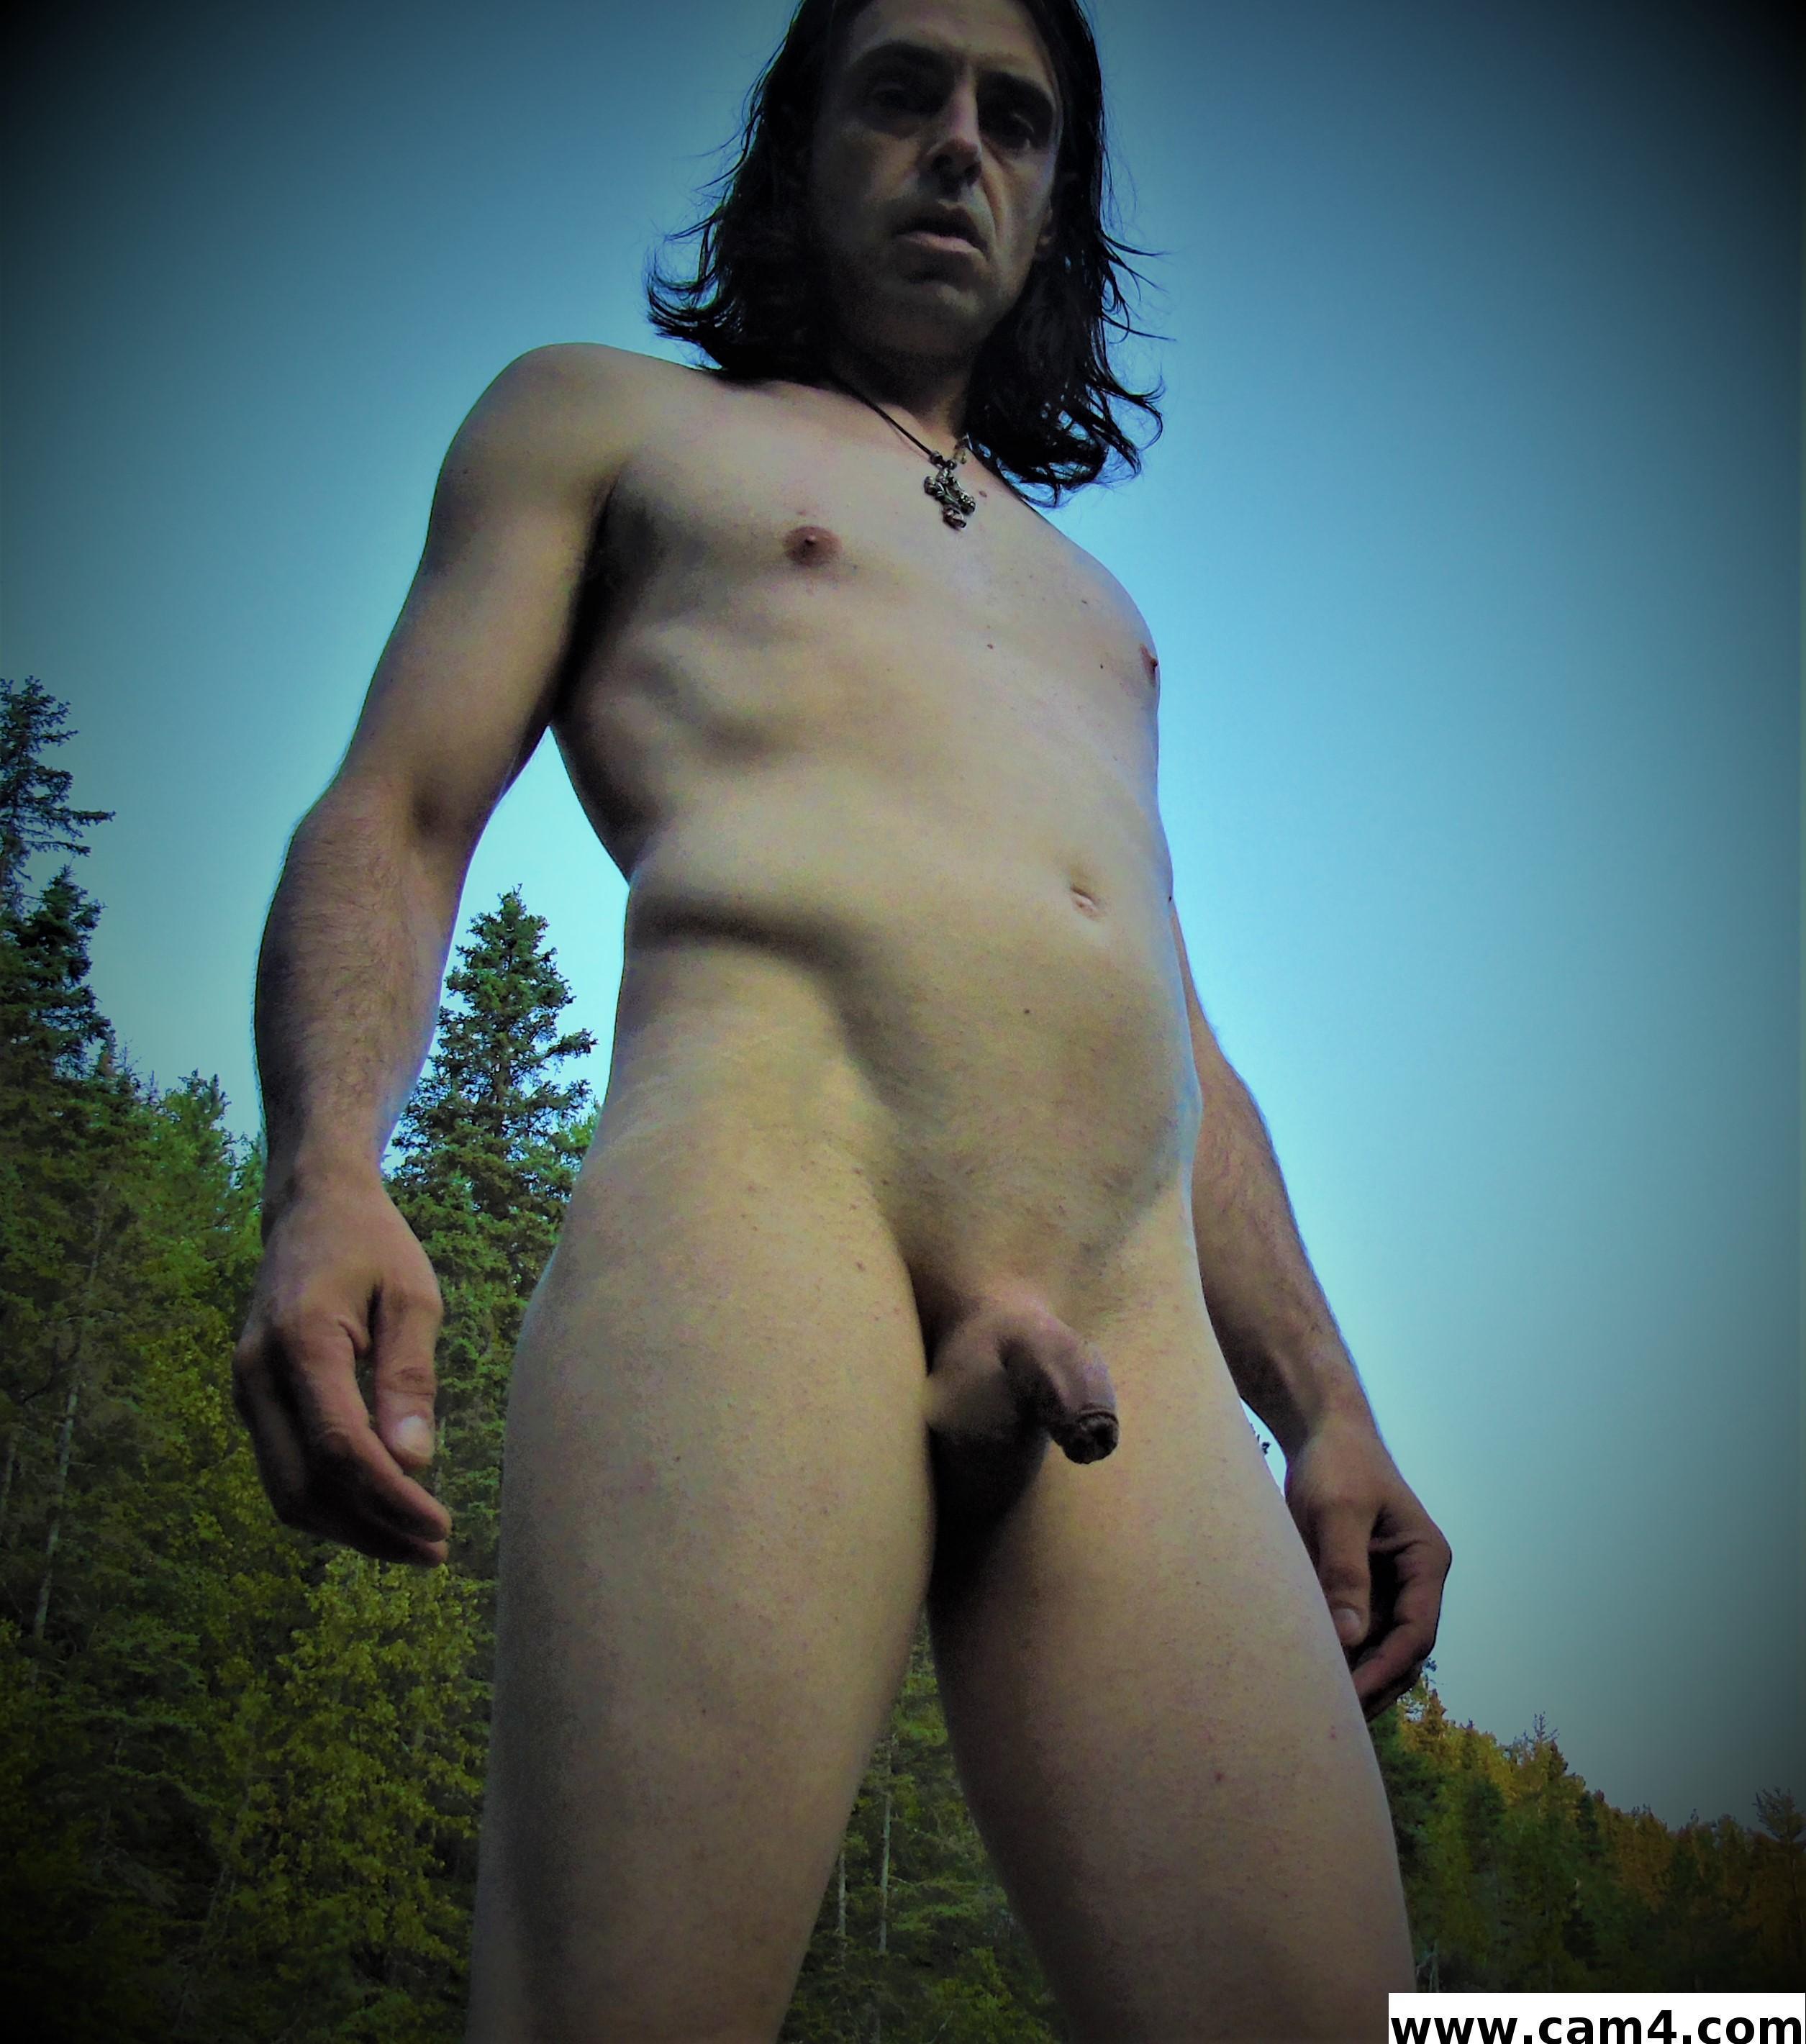 Sex1218?s=dsz+c82pke1qtzspbb+phbgicyesm2fbh8qwehc4io8=